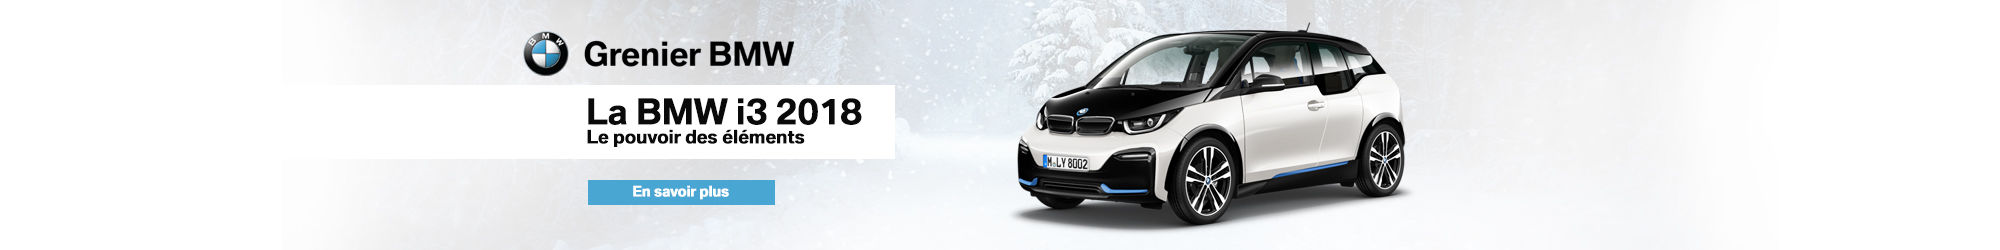 BMW i3 en inventaire (Janvier)